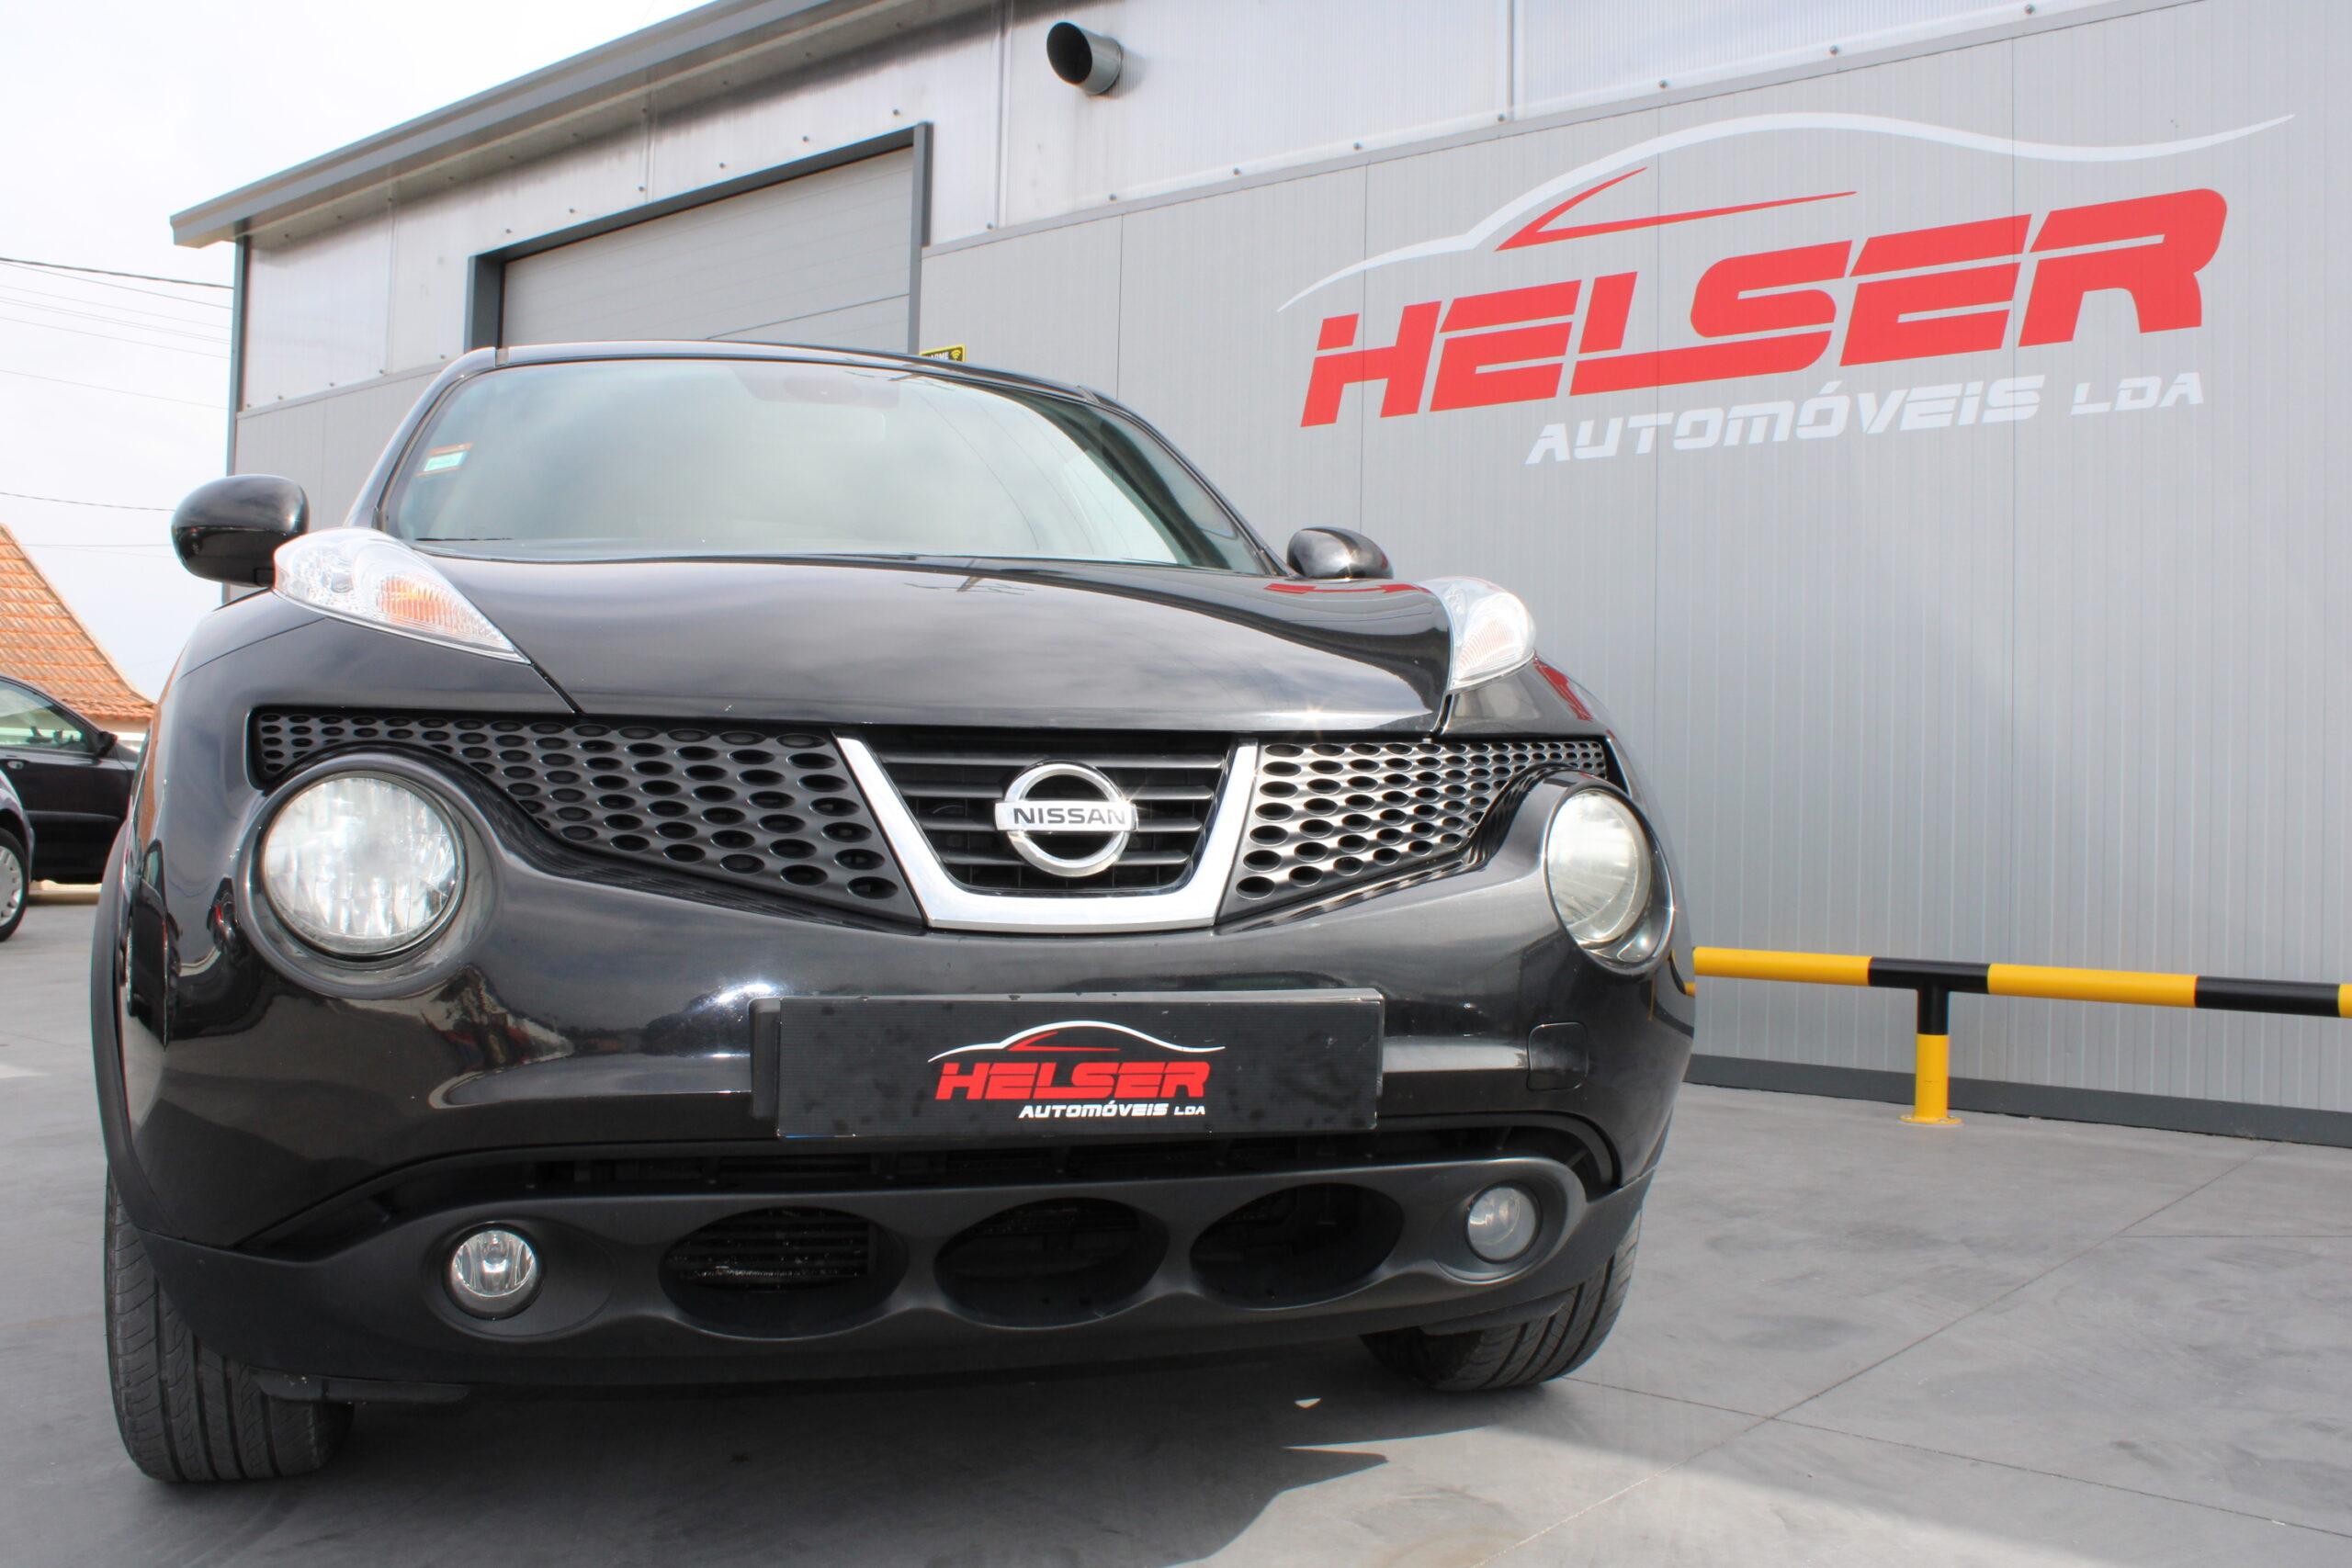 Nissan Juke 1.5 DCI - Acenta